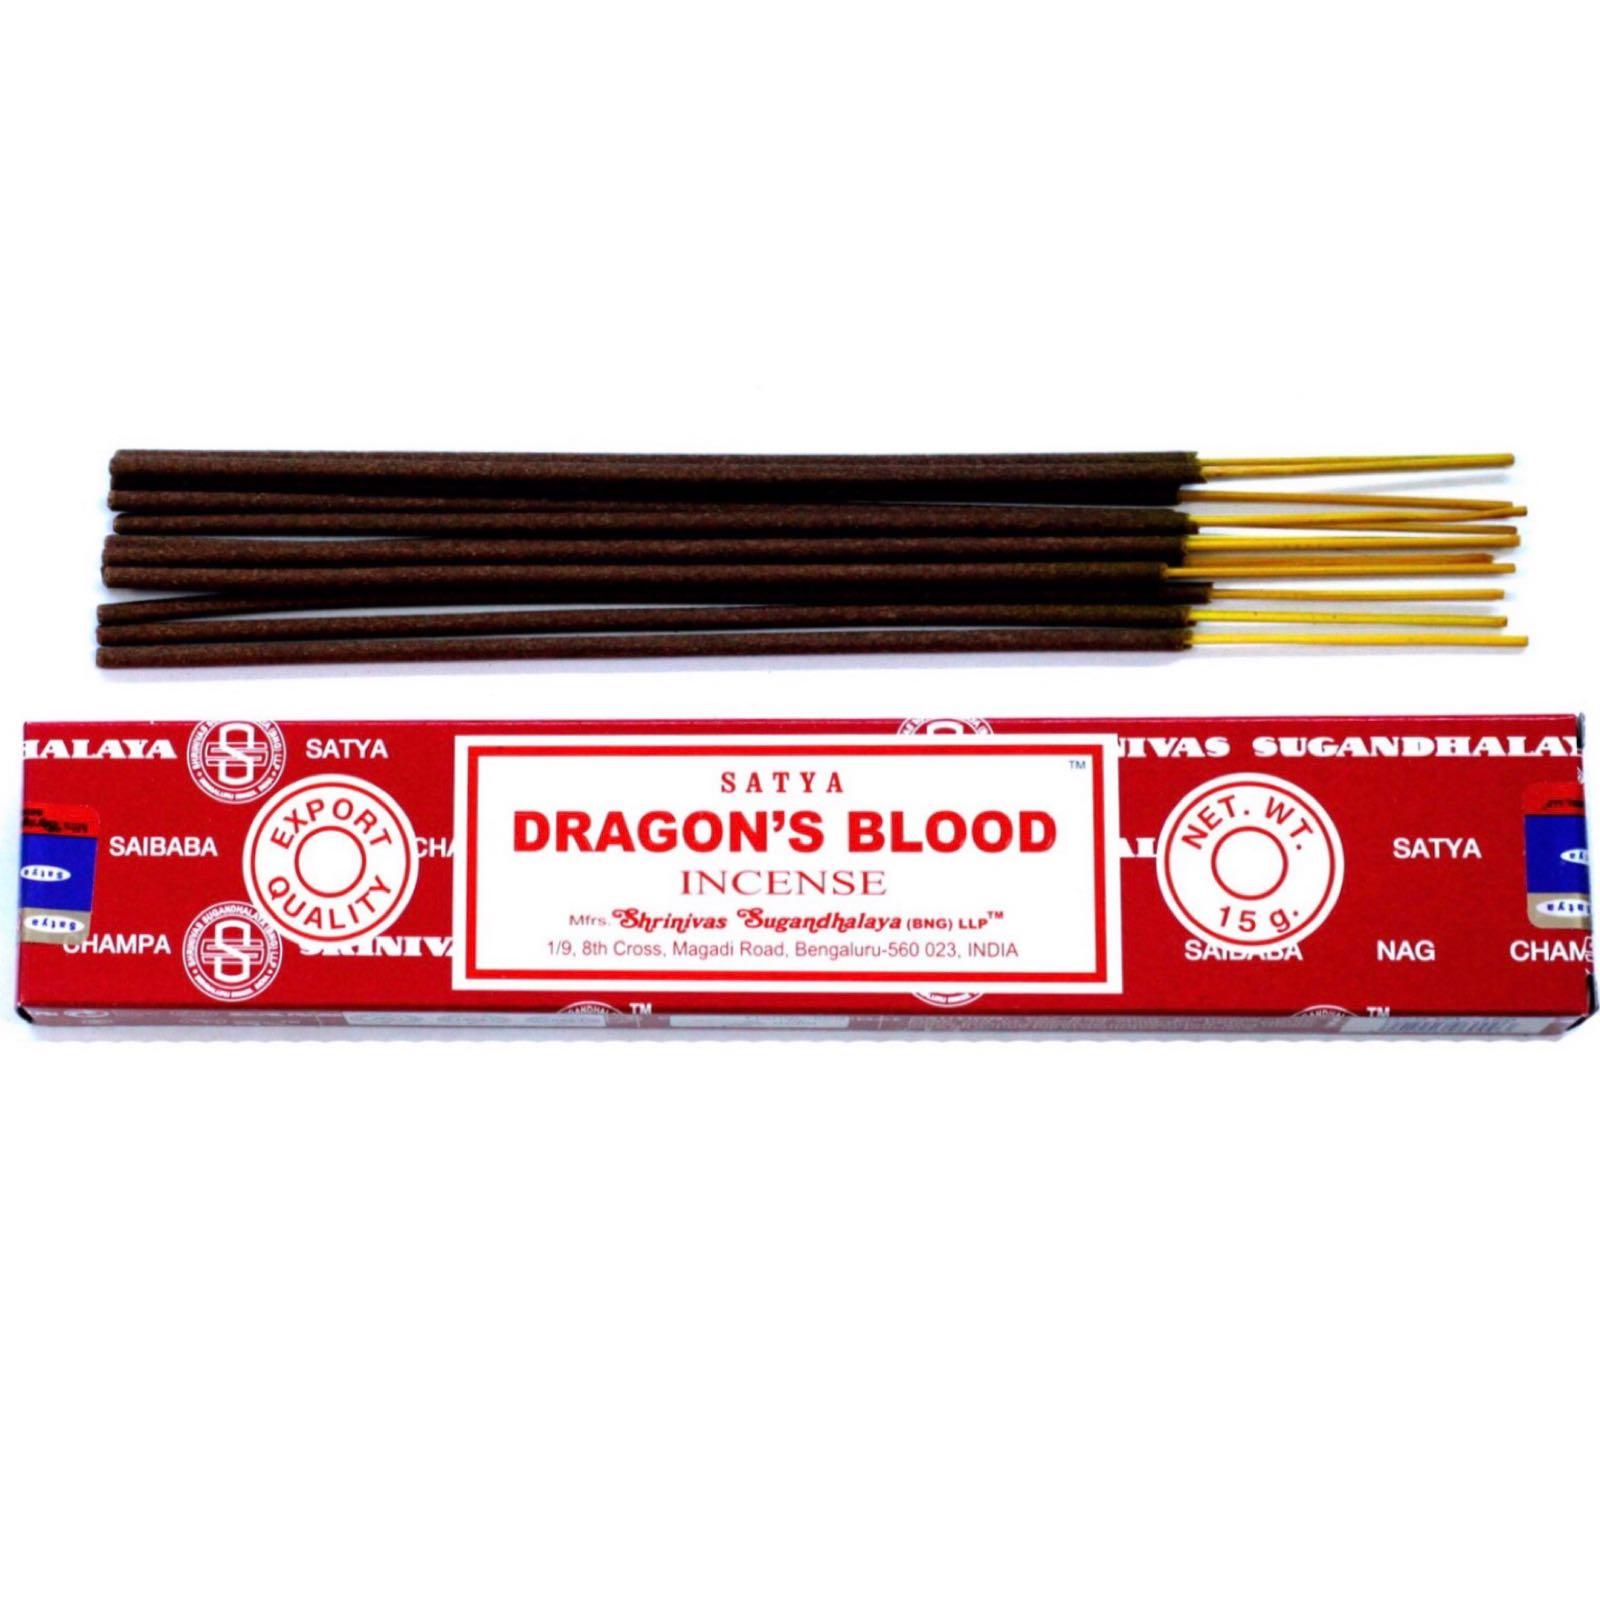 'Dragon's Blood' Incense Sticks (Was £1.85)